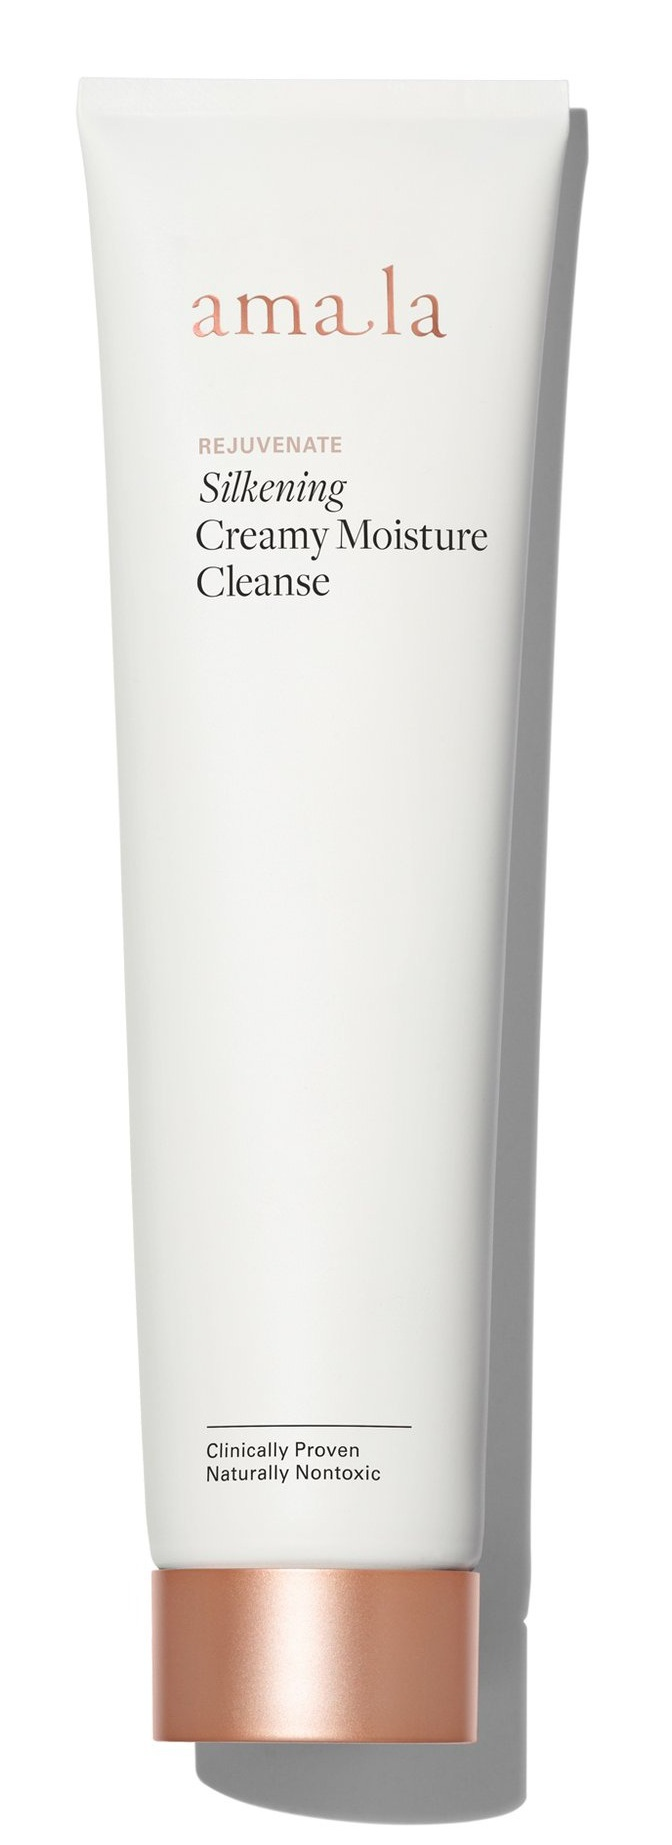 Amala Silkening Creamy Moisture Cleanse